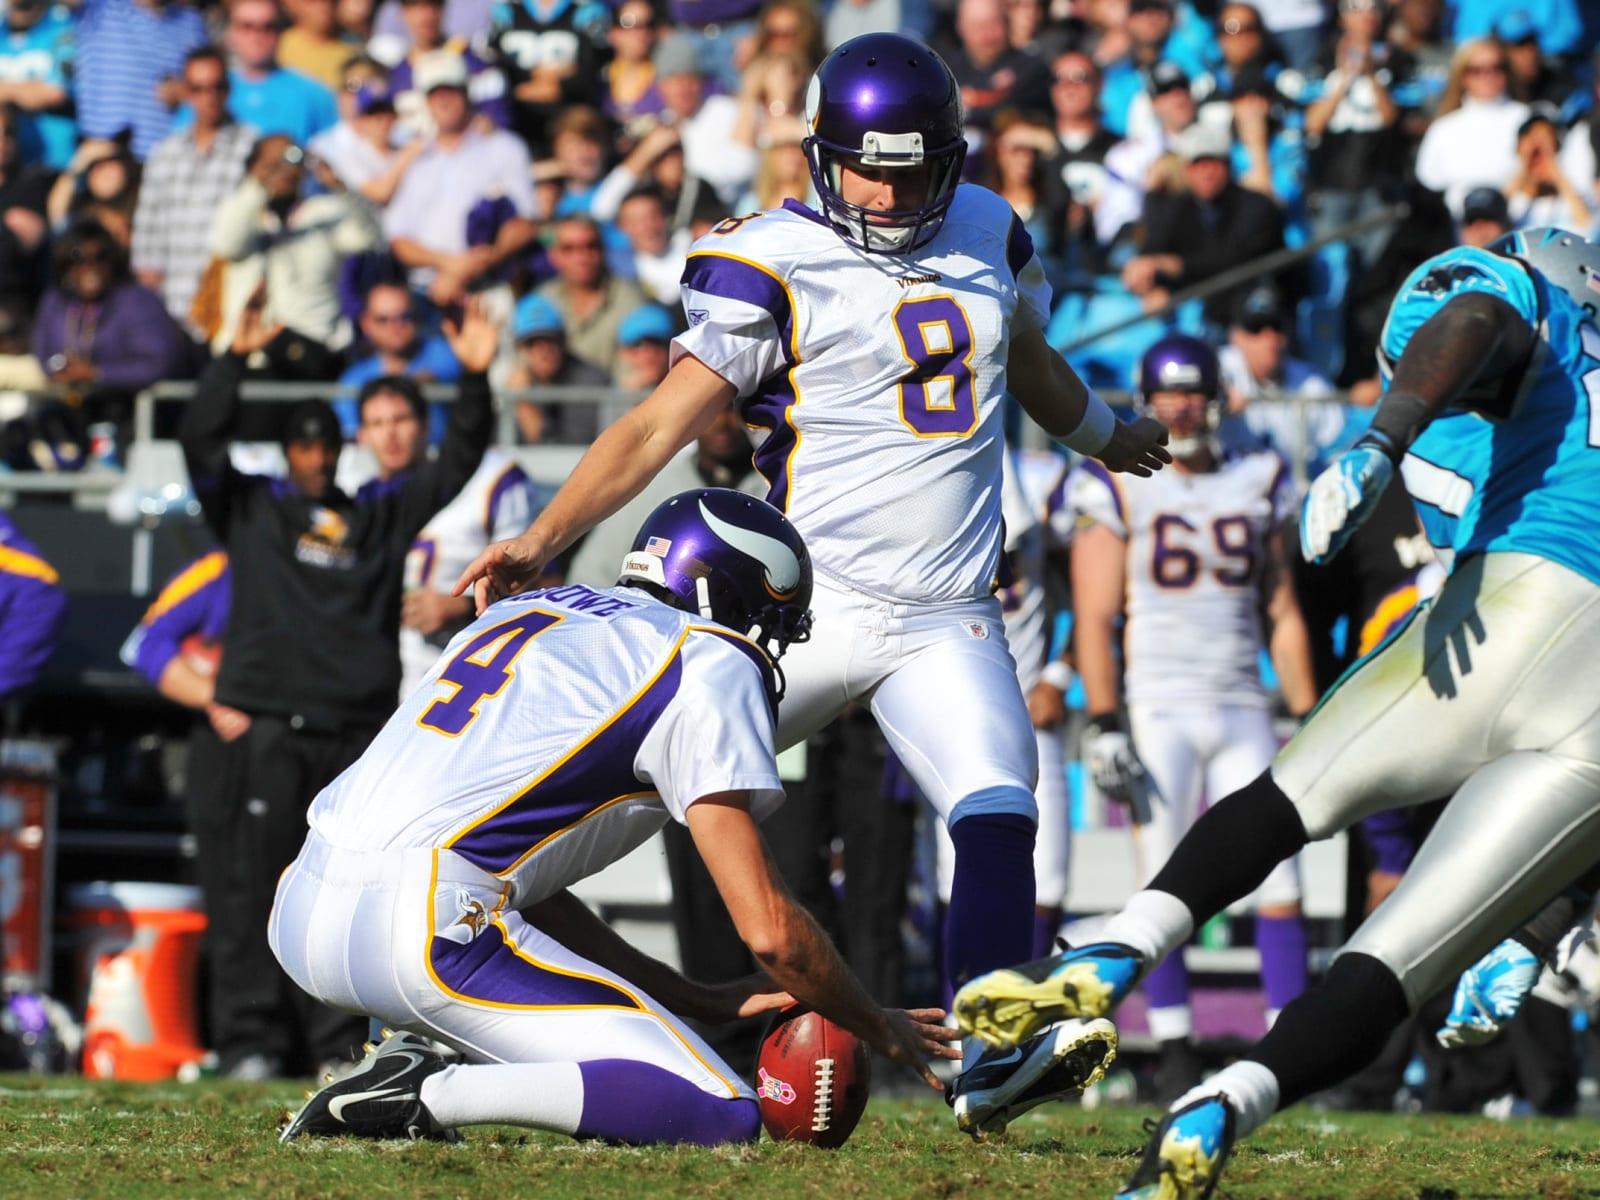 Ryan Longwell, Minnesota Vikings